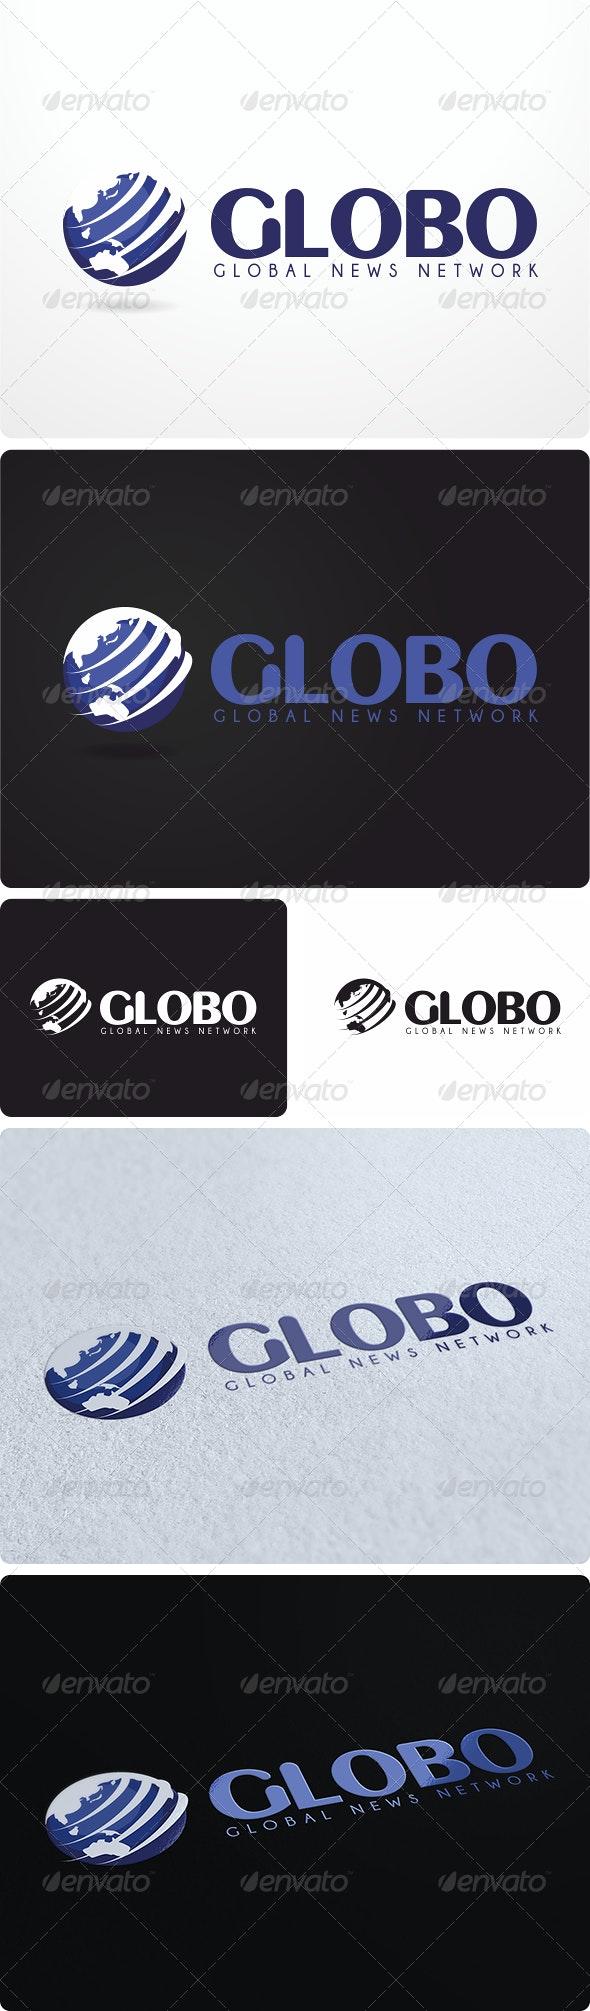 Globo News Logo Design - Symbols Logo Templates